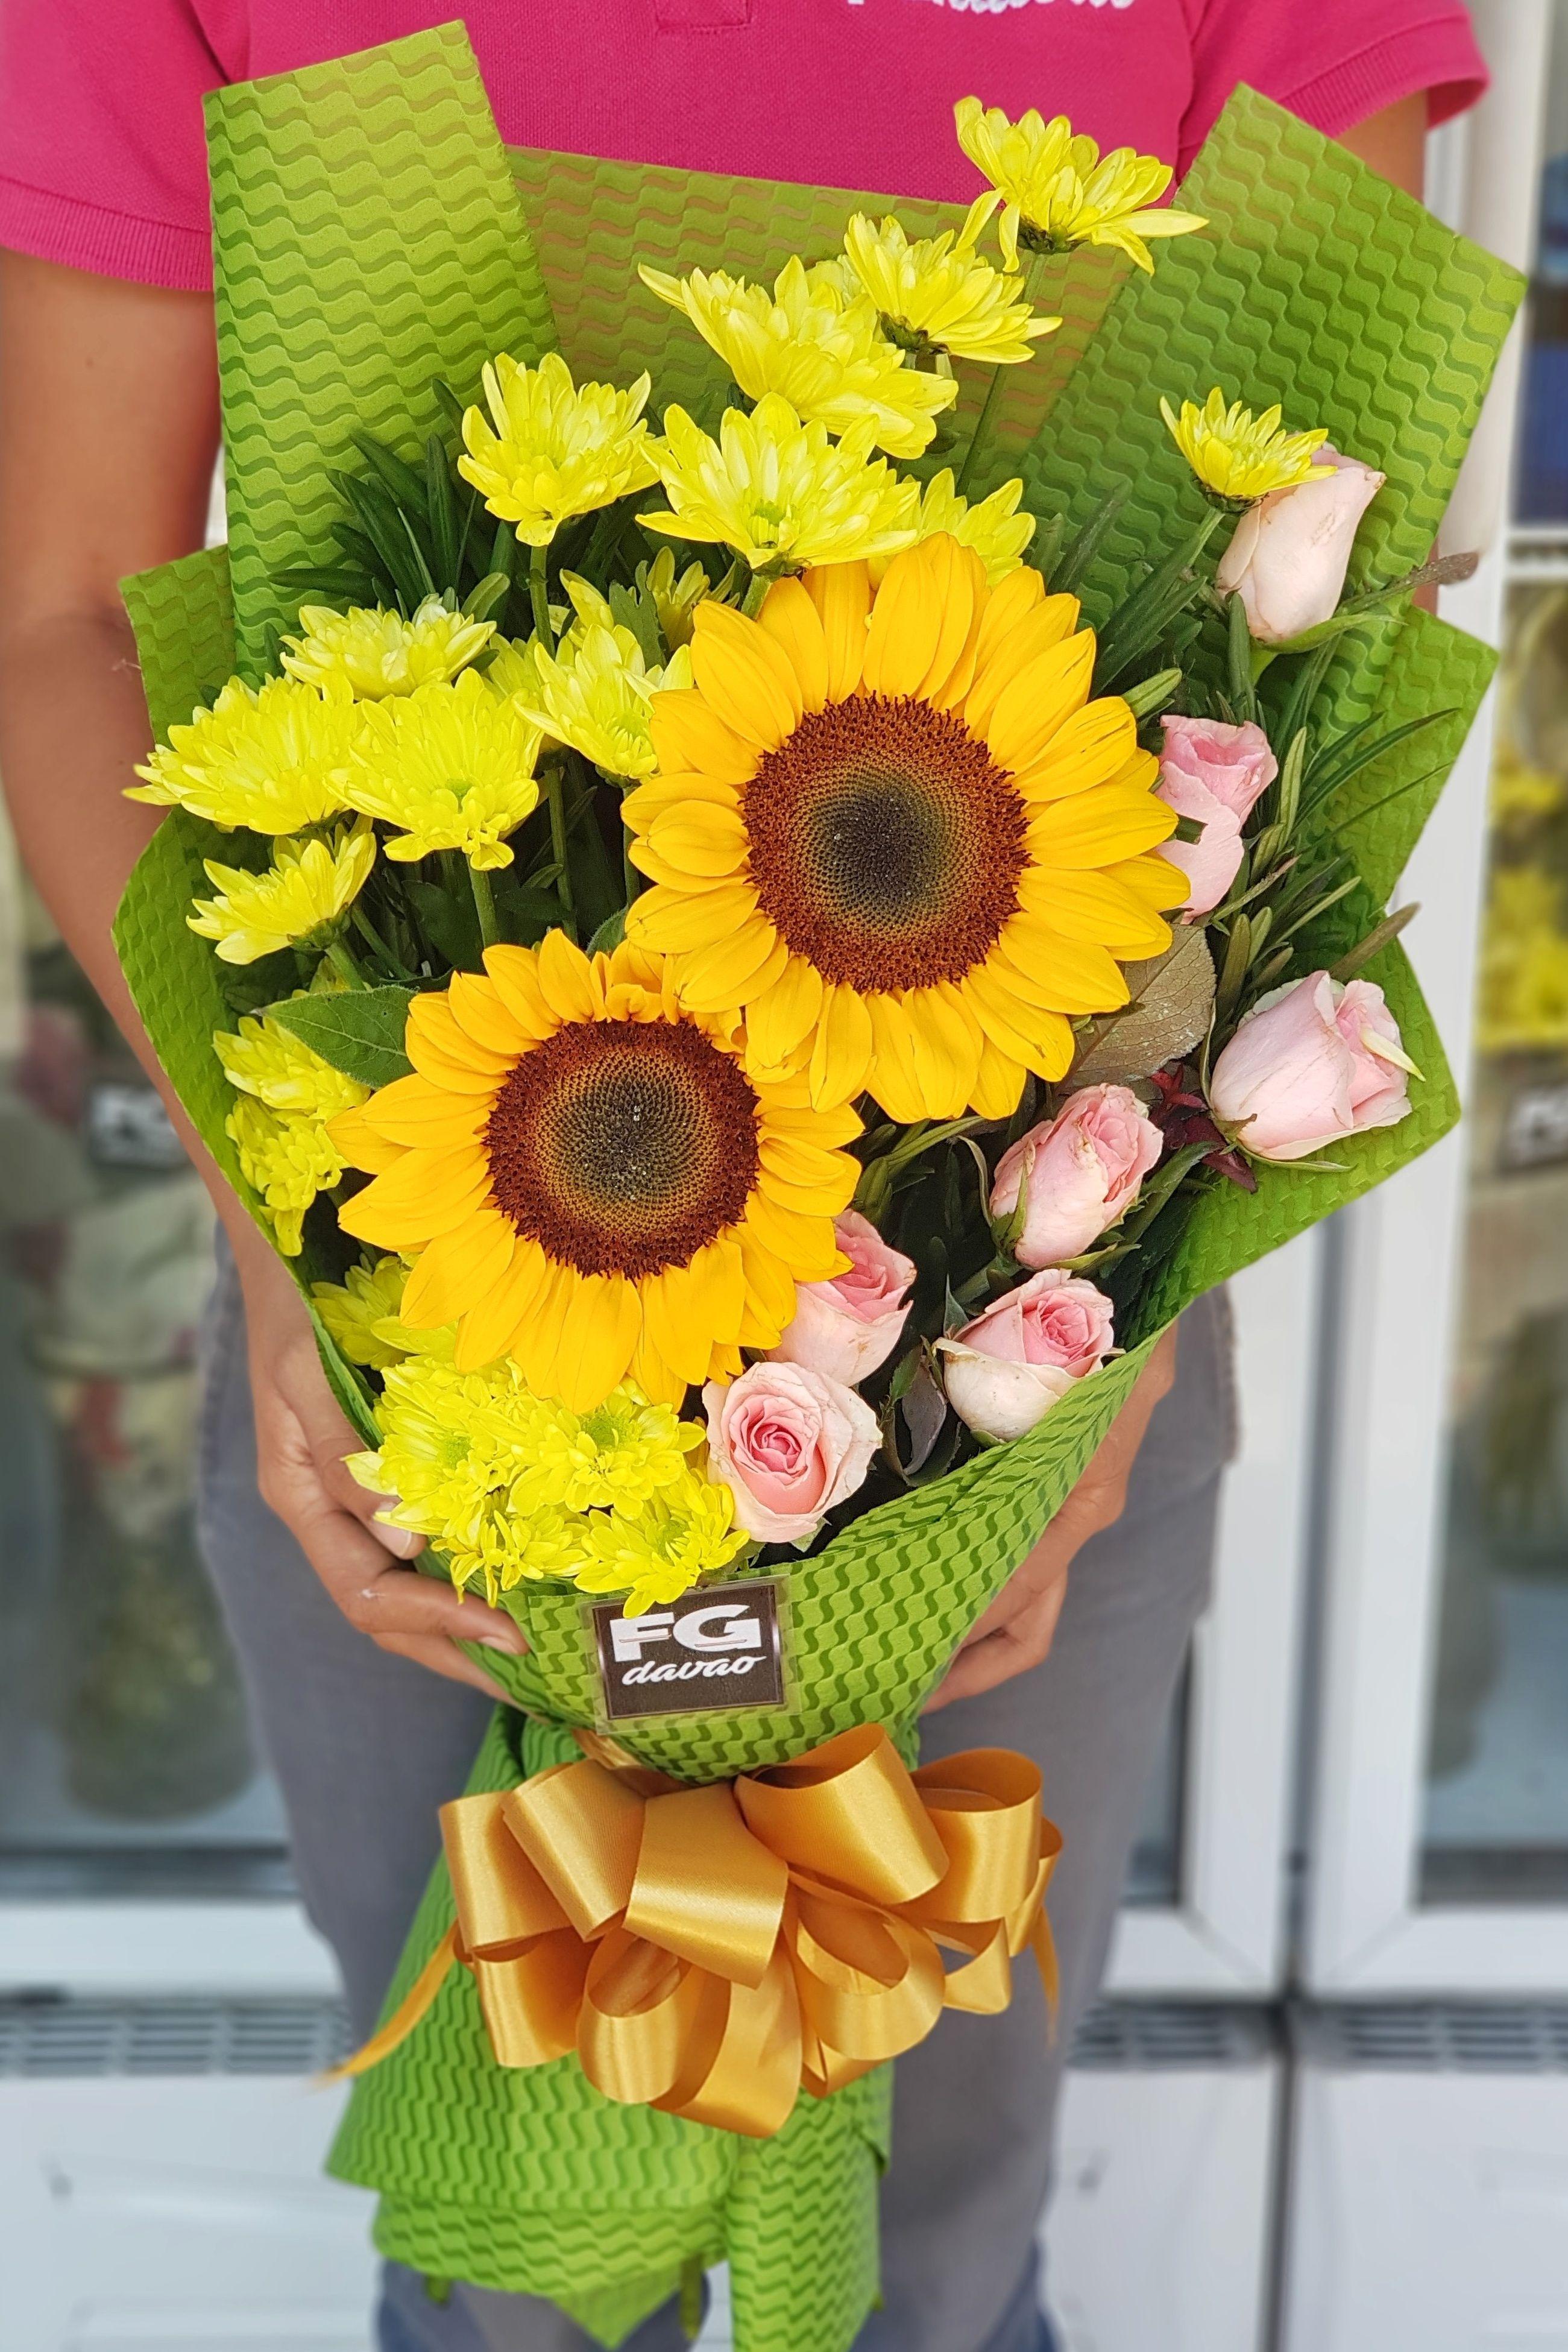 Pin by Hemlata mahale on flowers Online flower shop